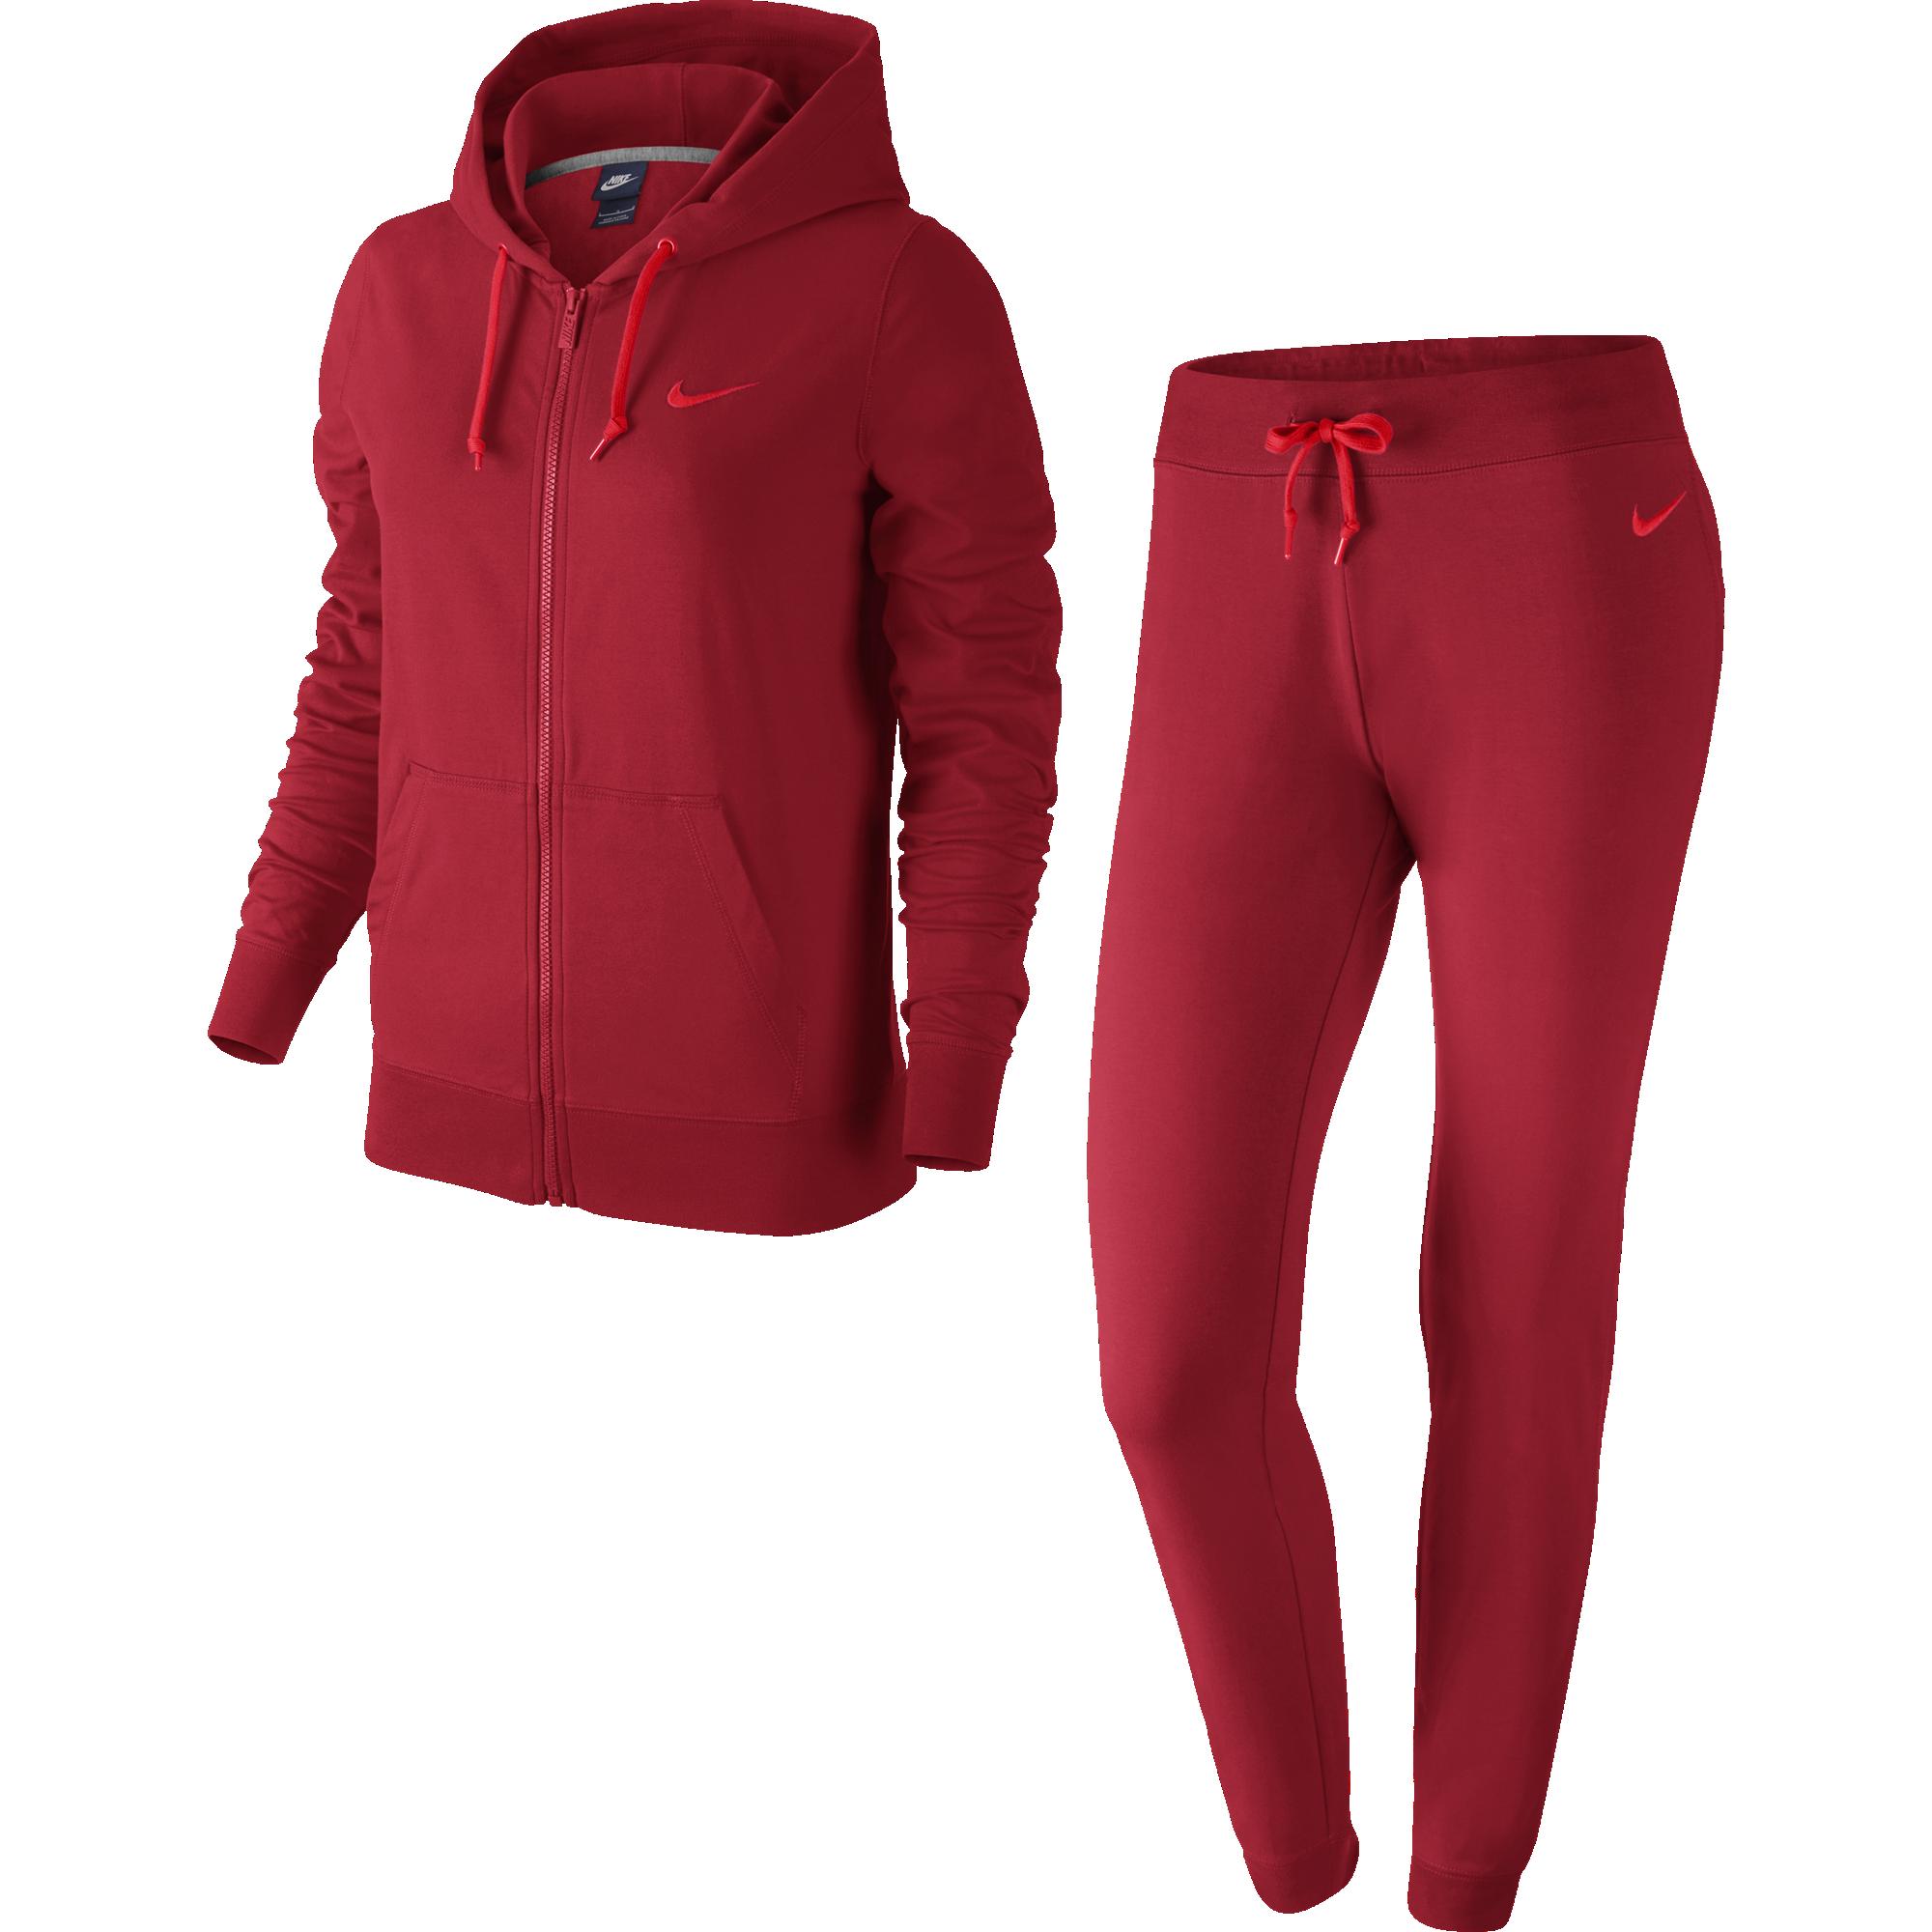 Nike Womens Nike Sportswear Track Suit NŐi MelegÍtŐ 623417-658 Női  Ruha melegito 5aafa6c9fe